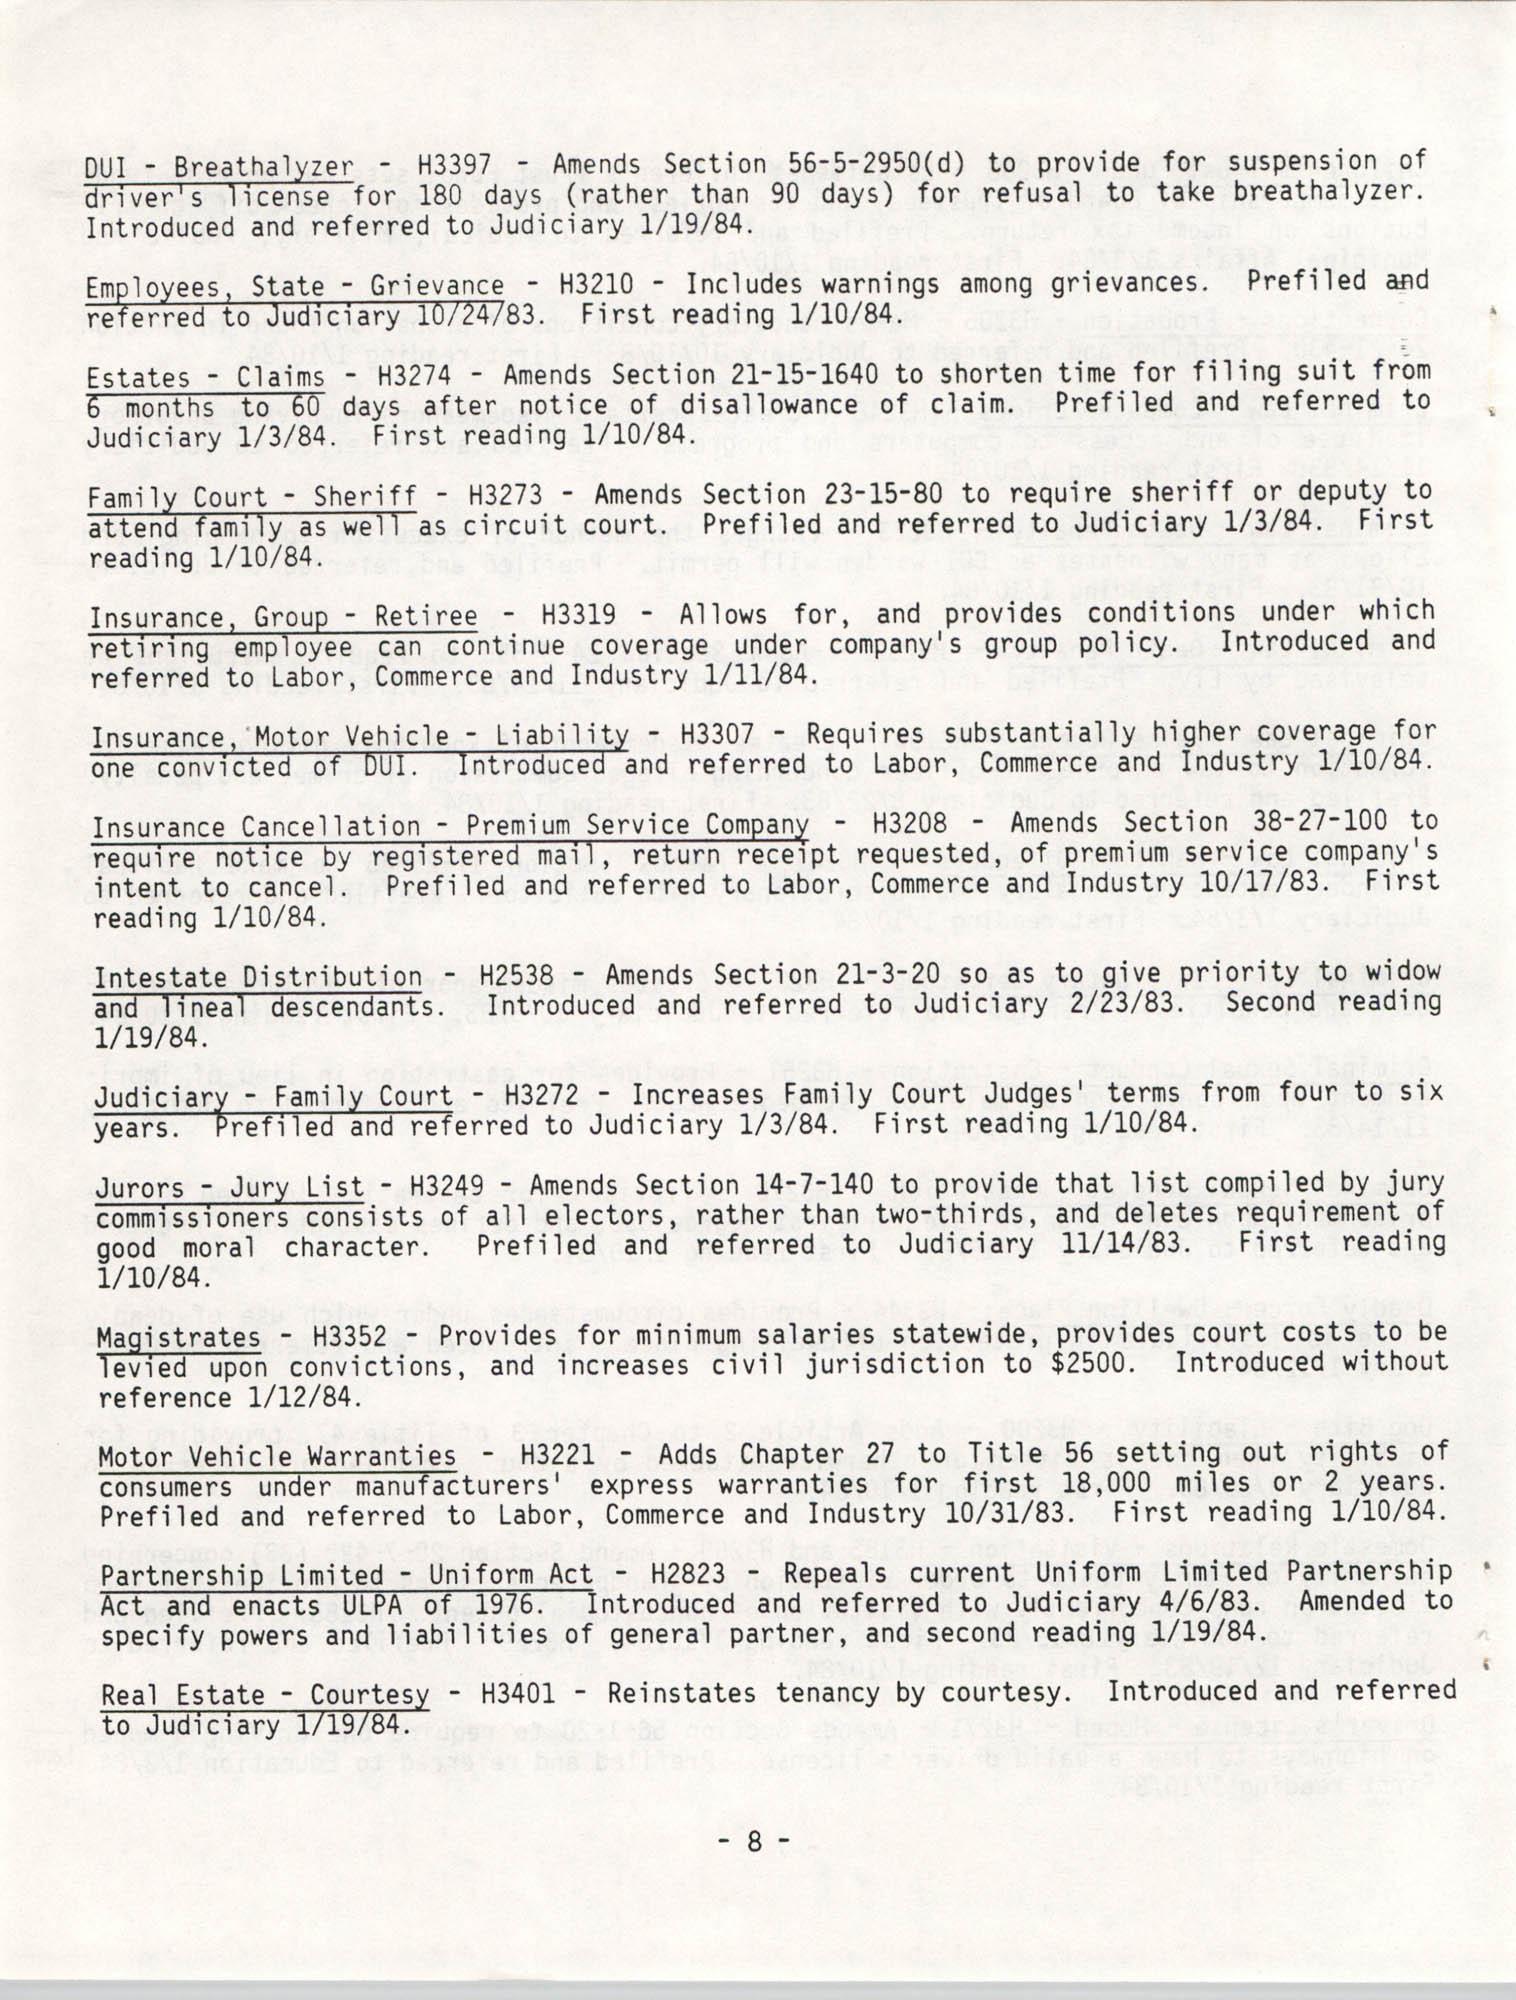 South Carolina Bar Legislative Roundup, Vol. 6 No. 1, January 26, 1984, Page 8